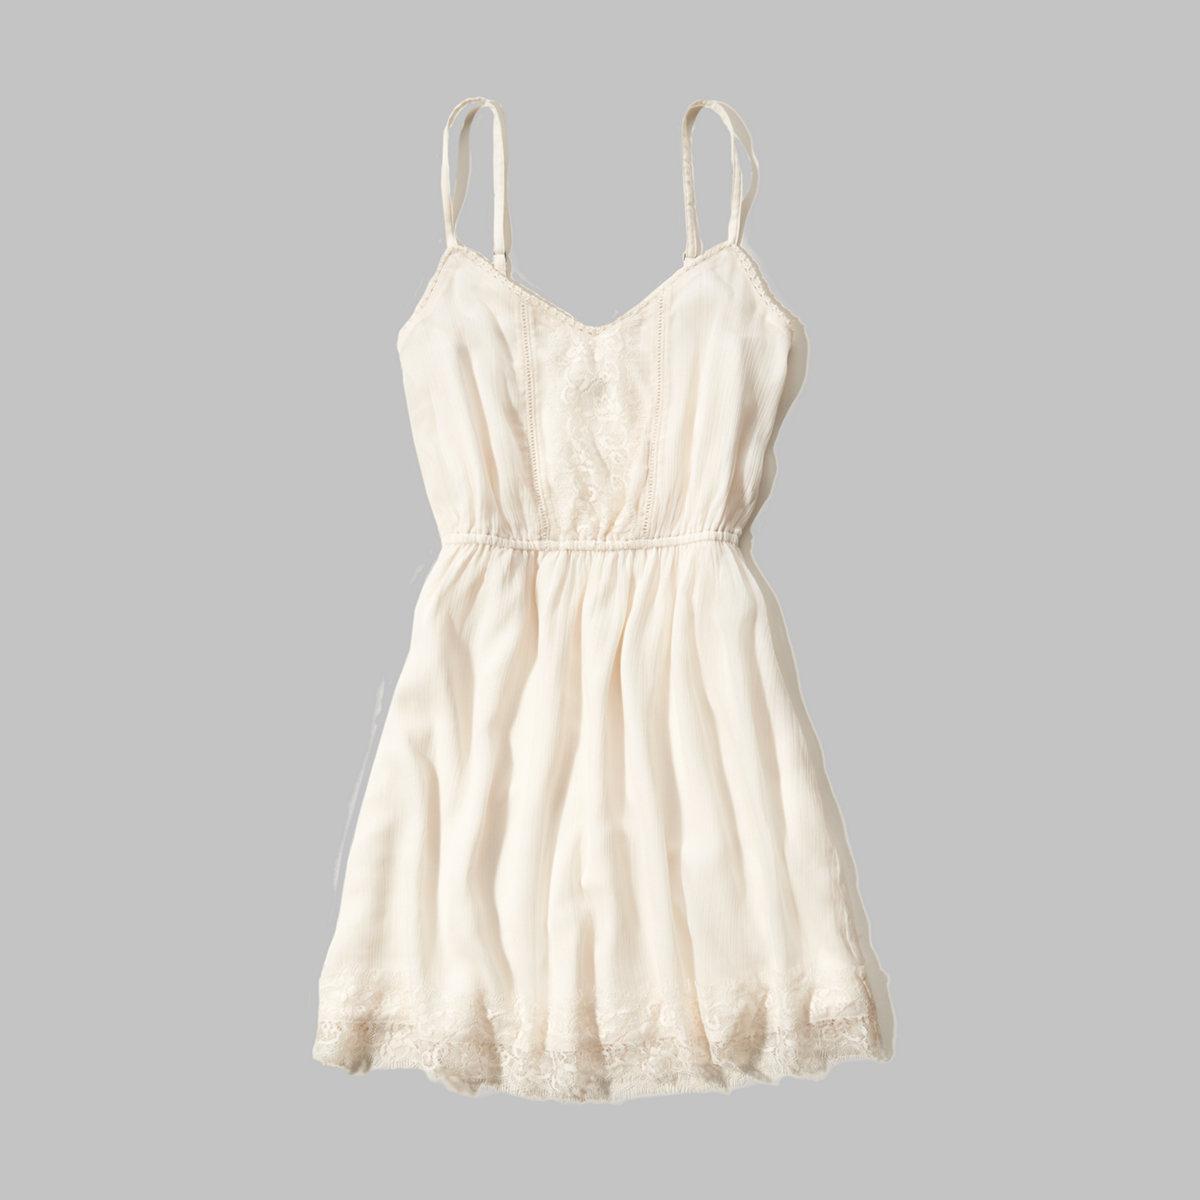 Imperial Beach Chiffon Dress